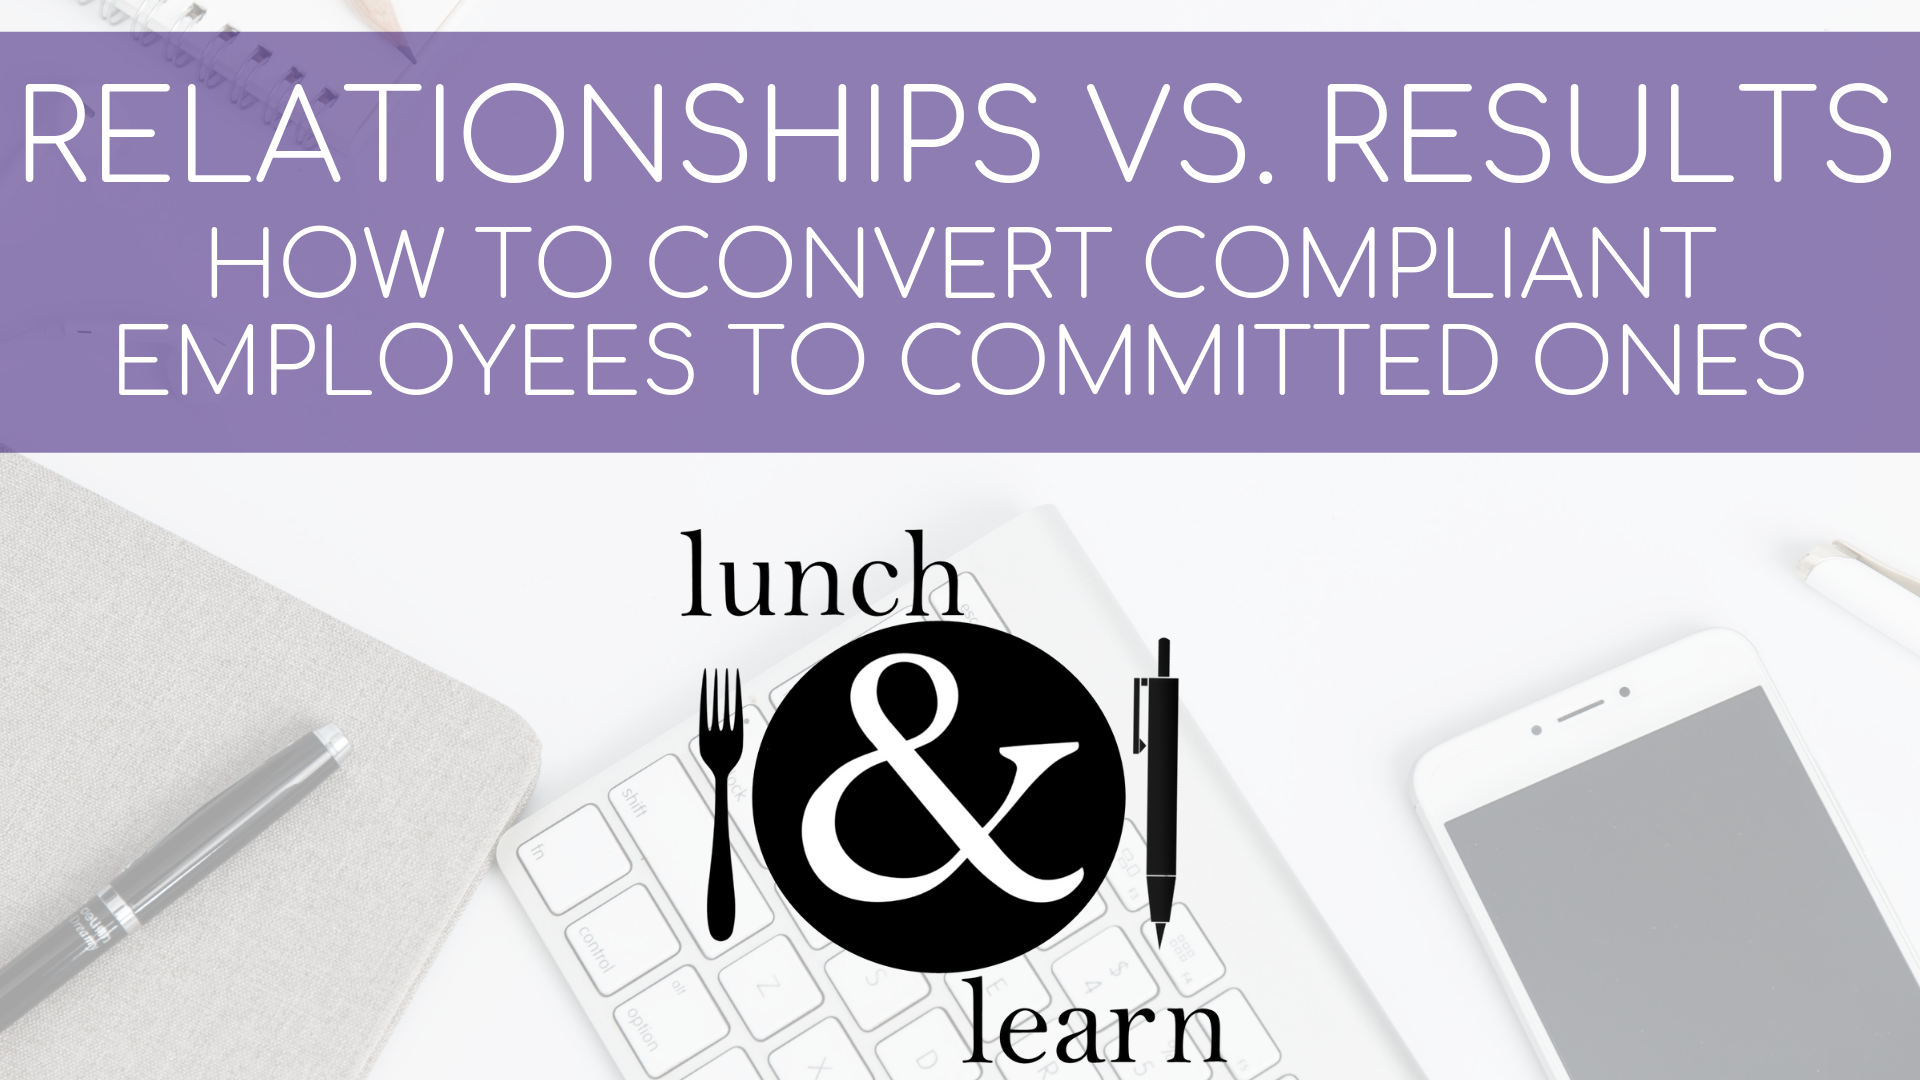 Relationships vs. Results